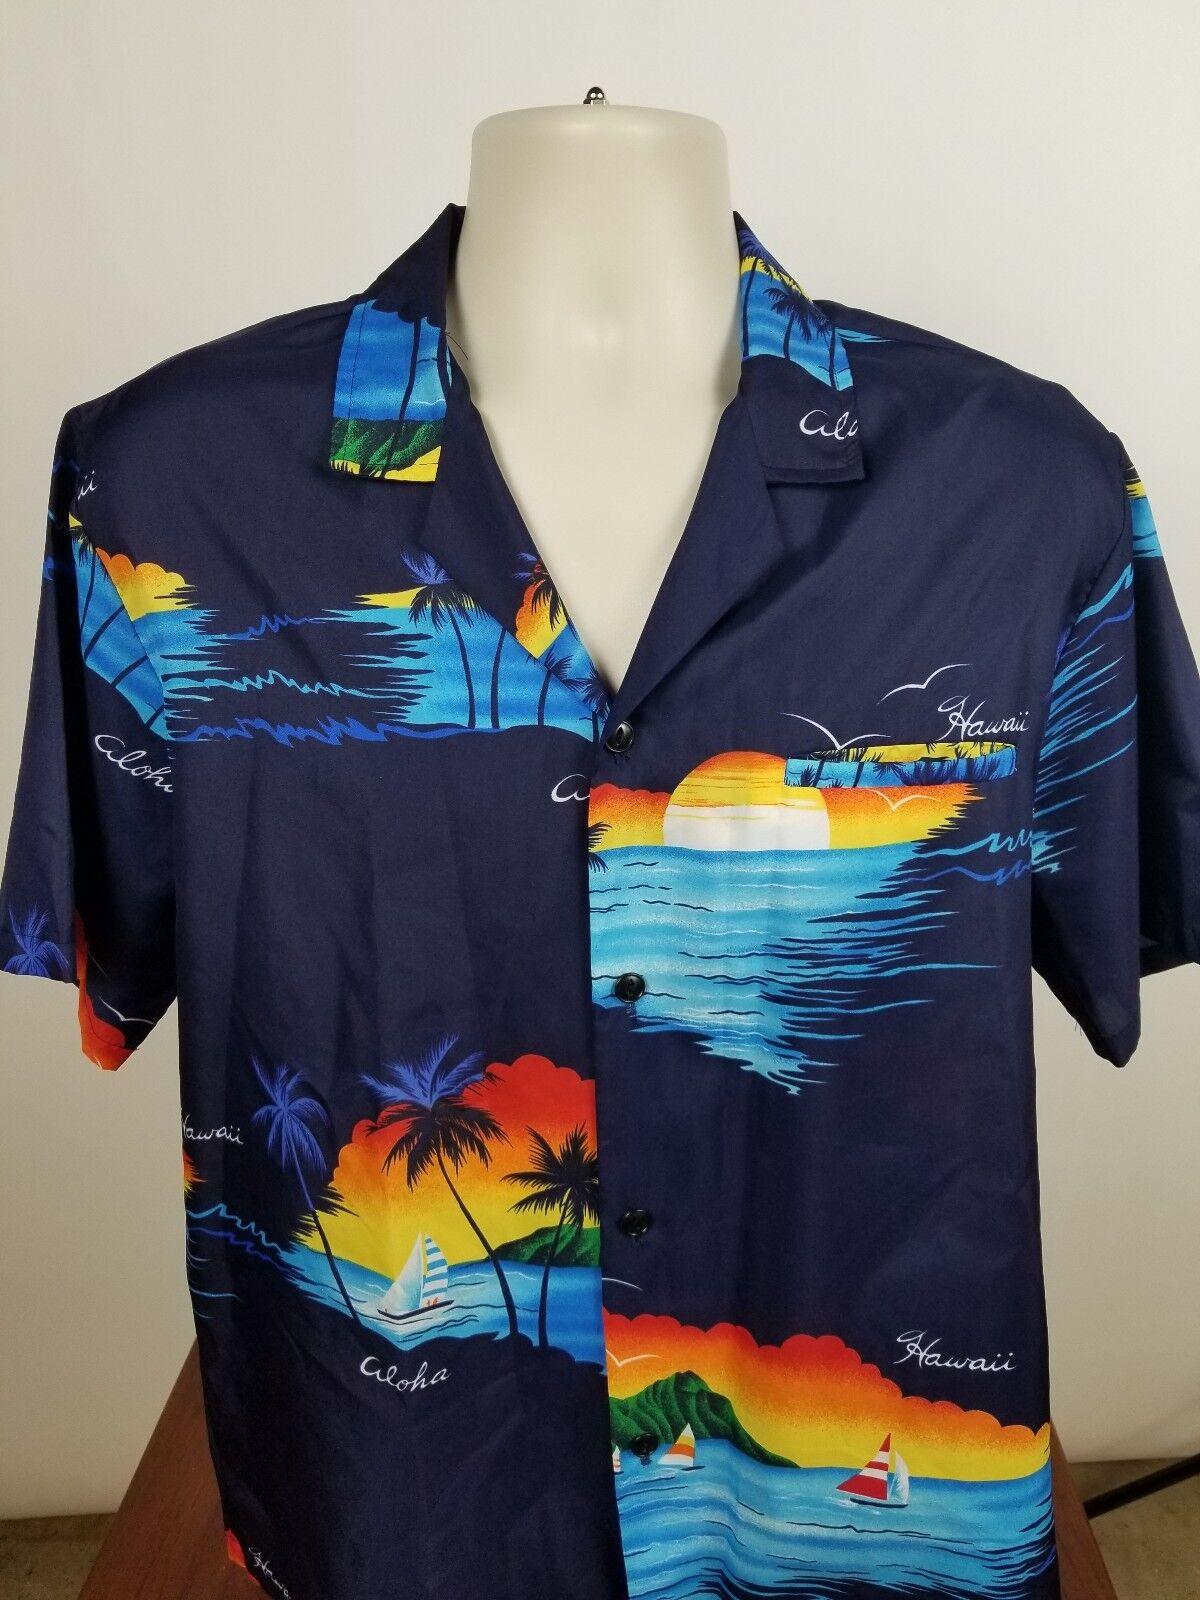 Large Aloha Hawaiian Shirt Casual Wear Hawaii blu Aloha Sailing Sailing Sailing Boats EUC ba17c2